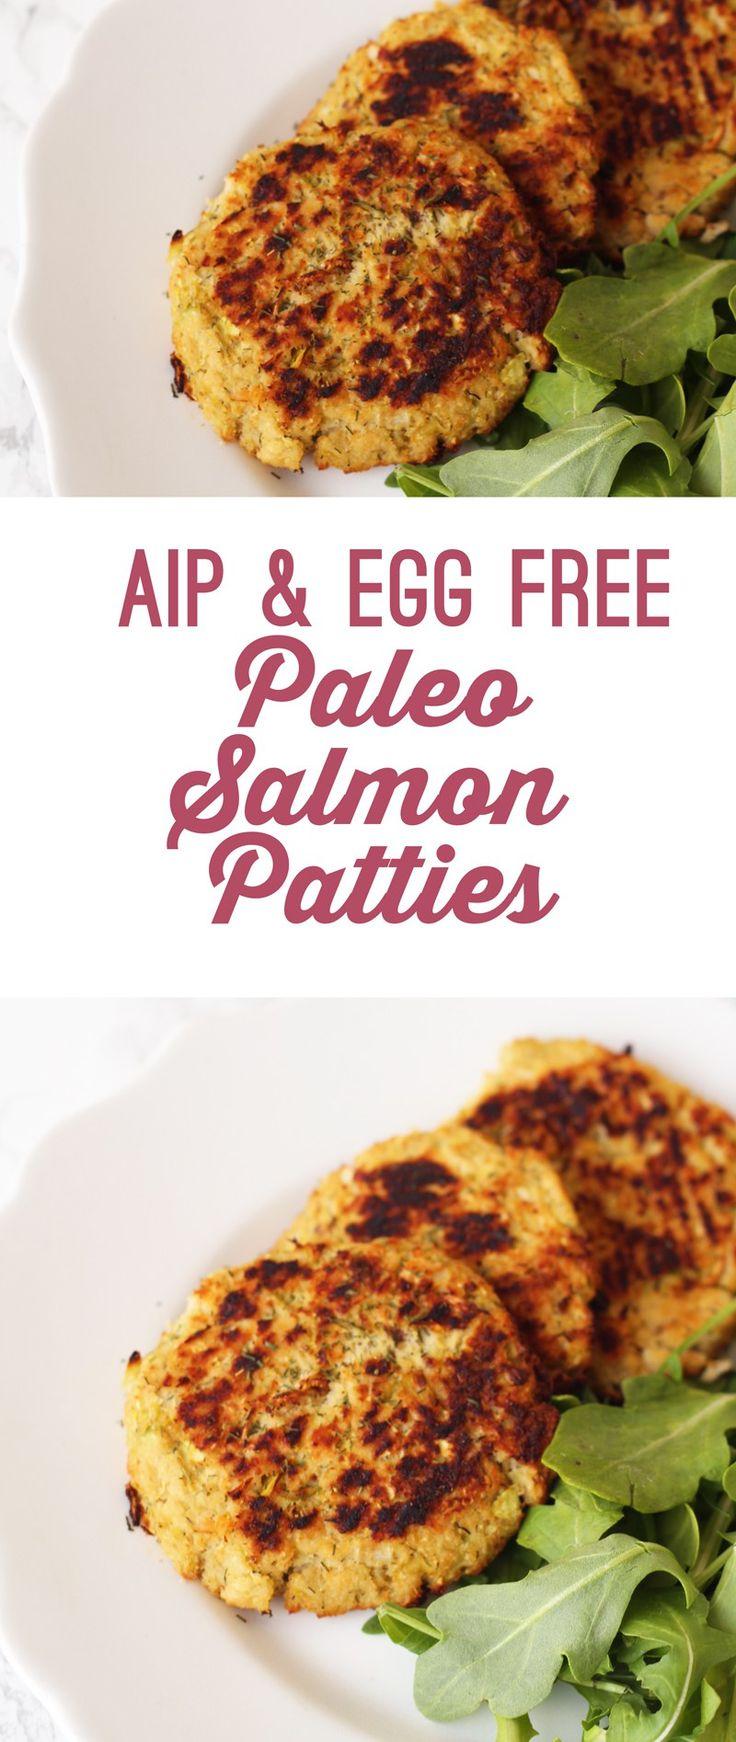 AIP Paleo Salmon Patties -- (paleo, AIP, gluten free, grain free, dairy free, egg free, soy free, nut free, refined sugar free)